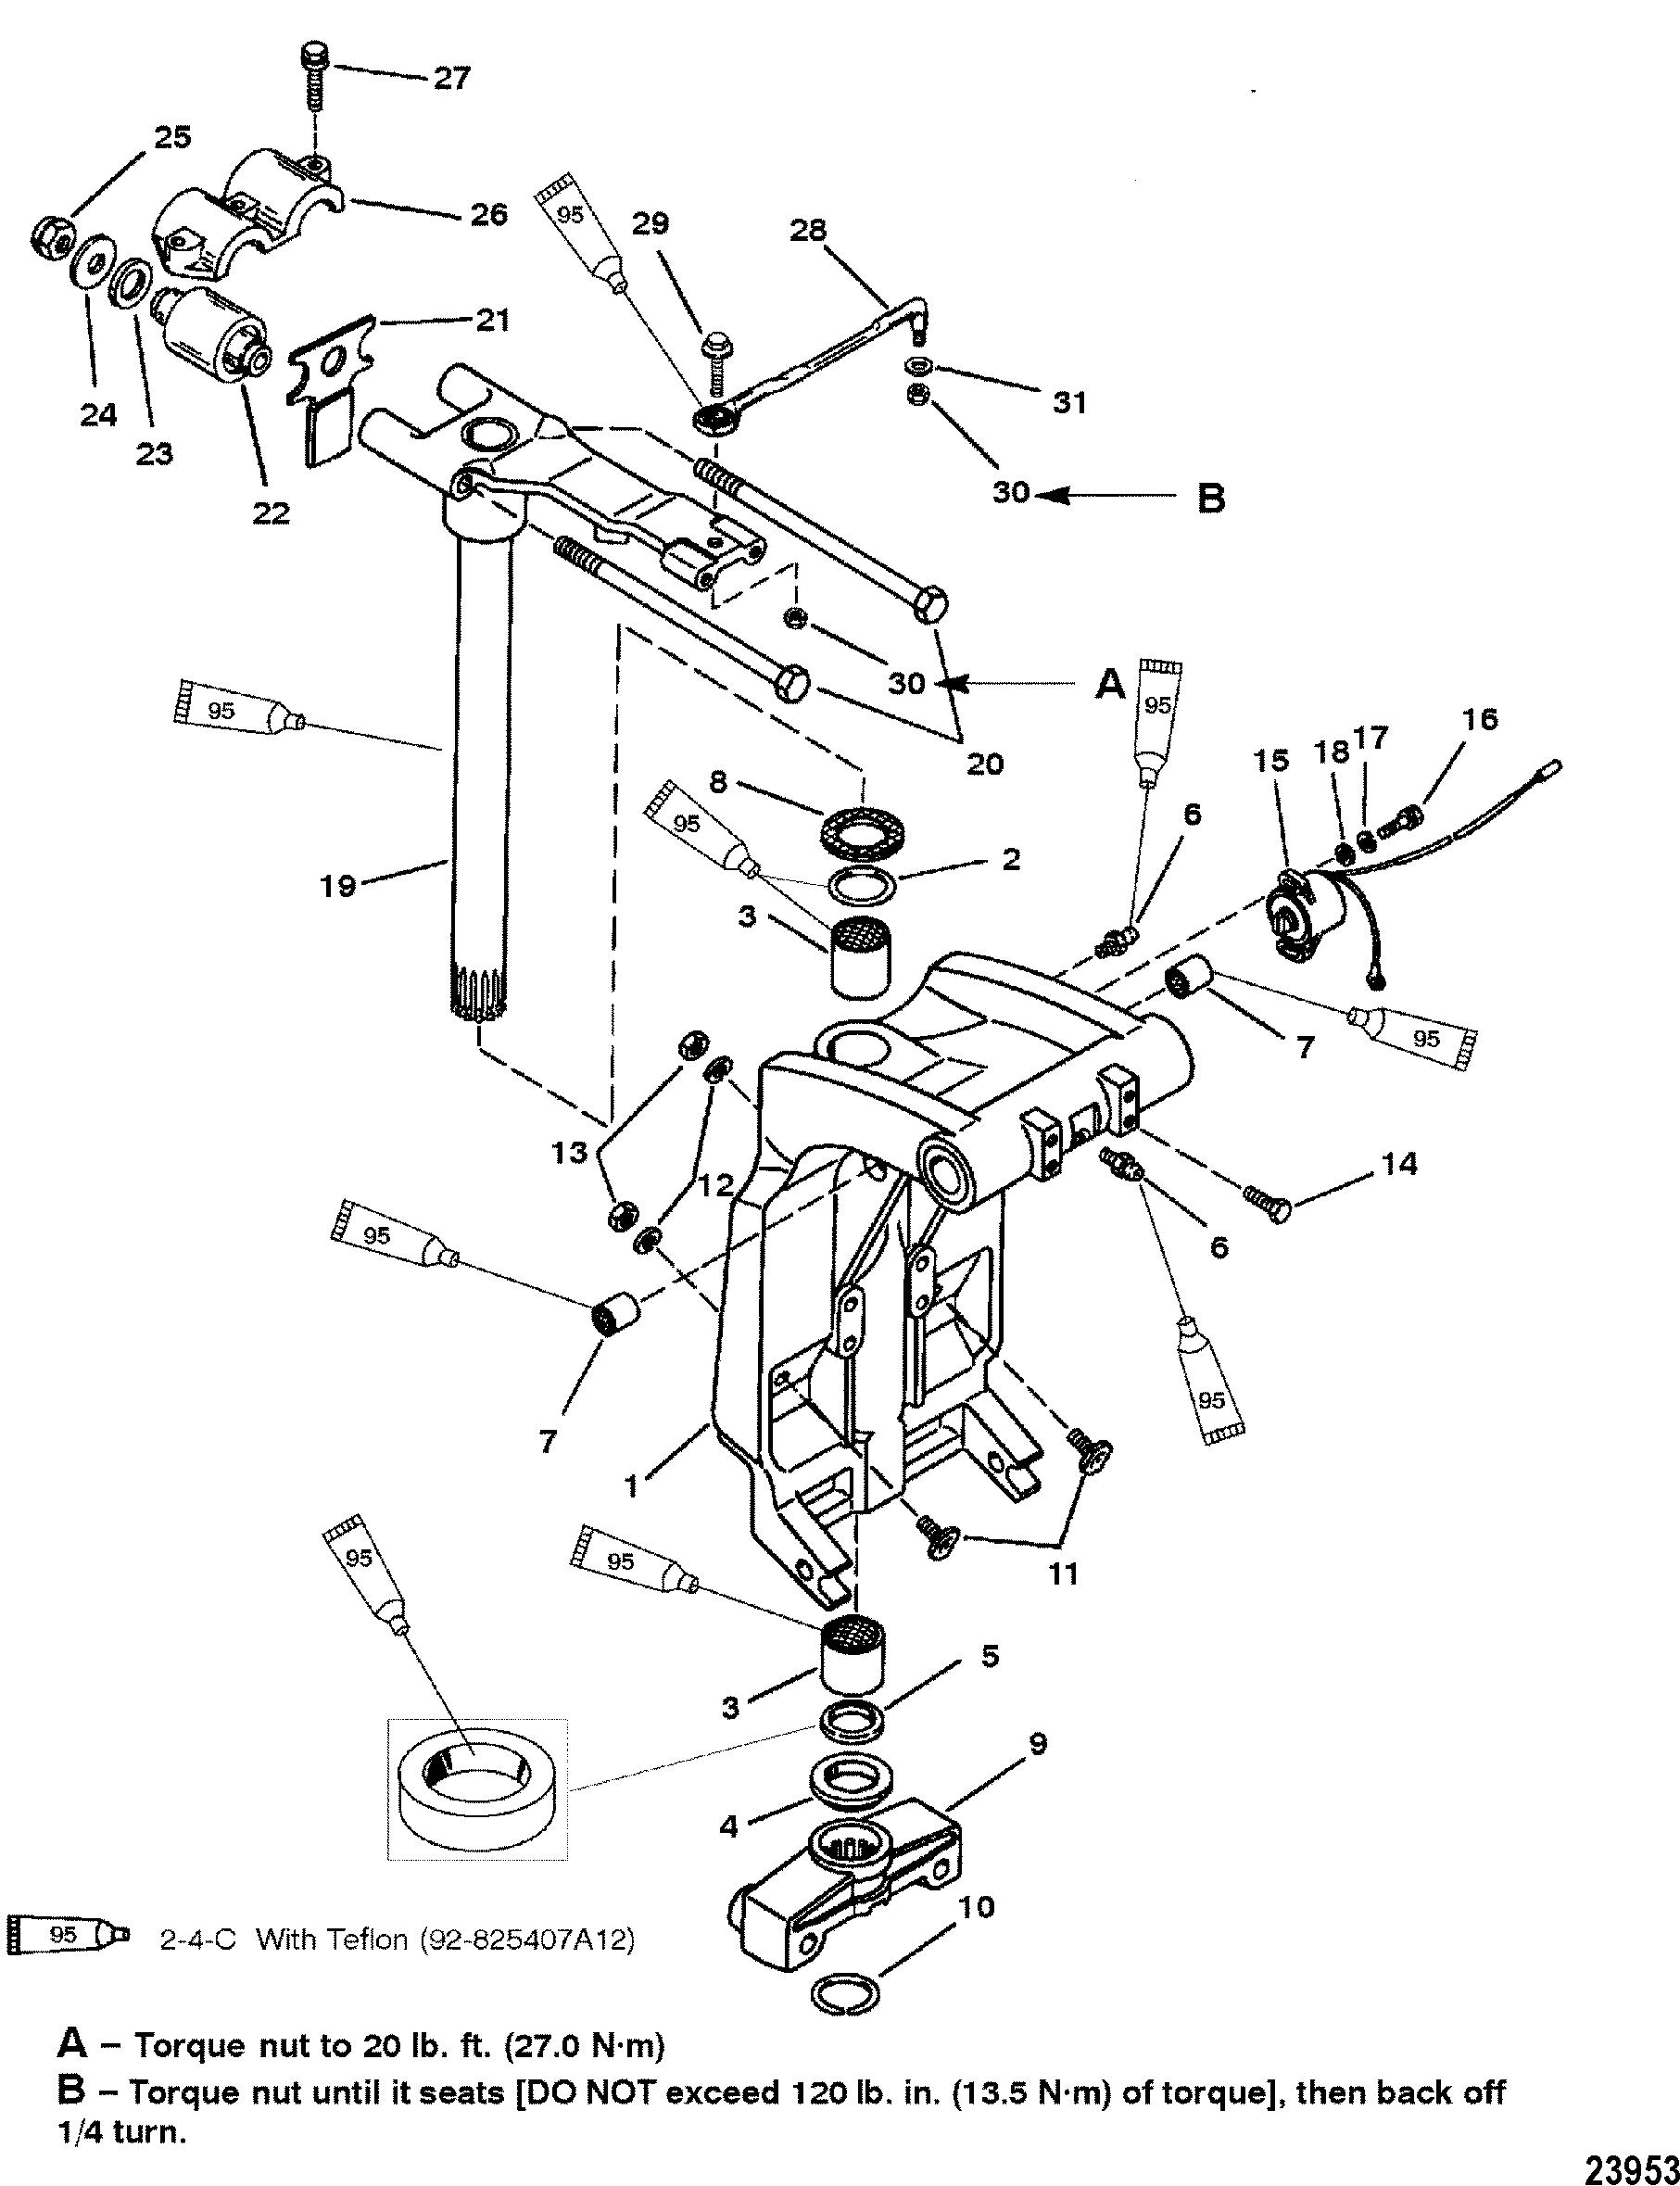 hight resolution of swivel bracket and steering arm for mariner mercury 225 250 efi 3 0l